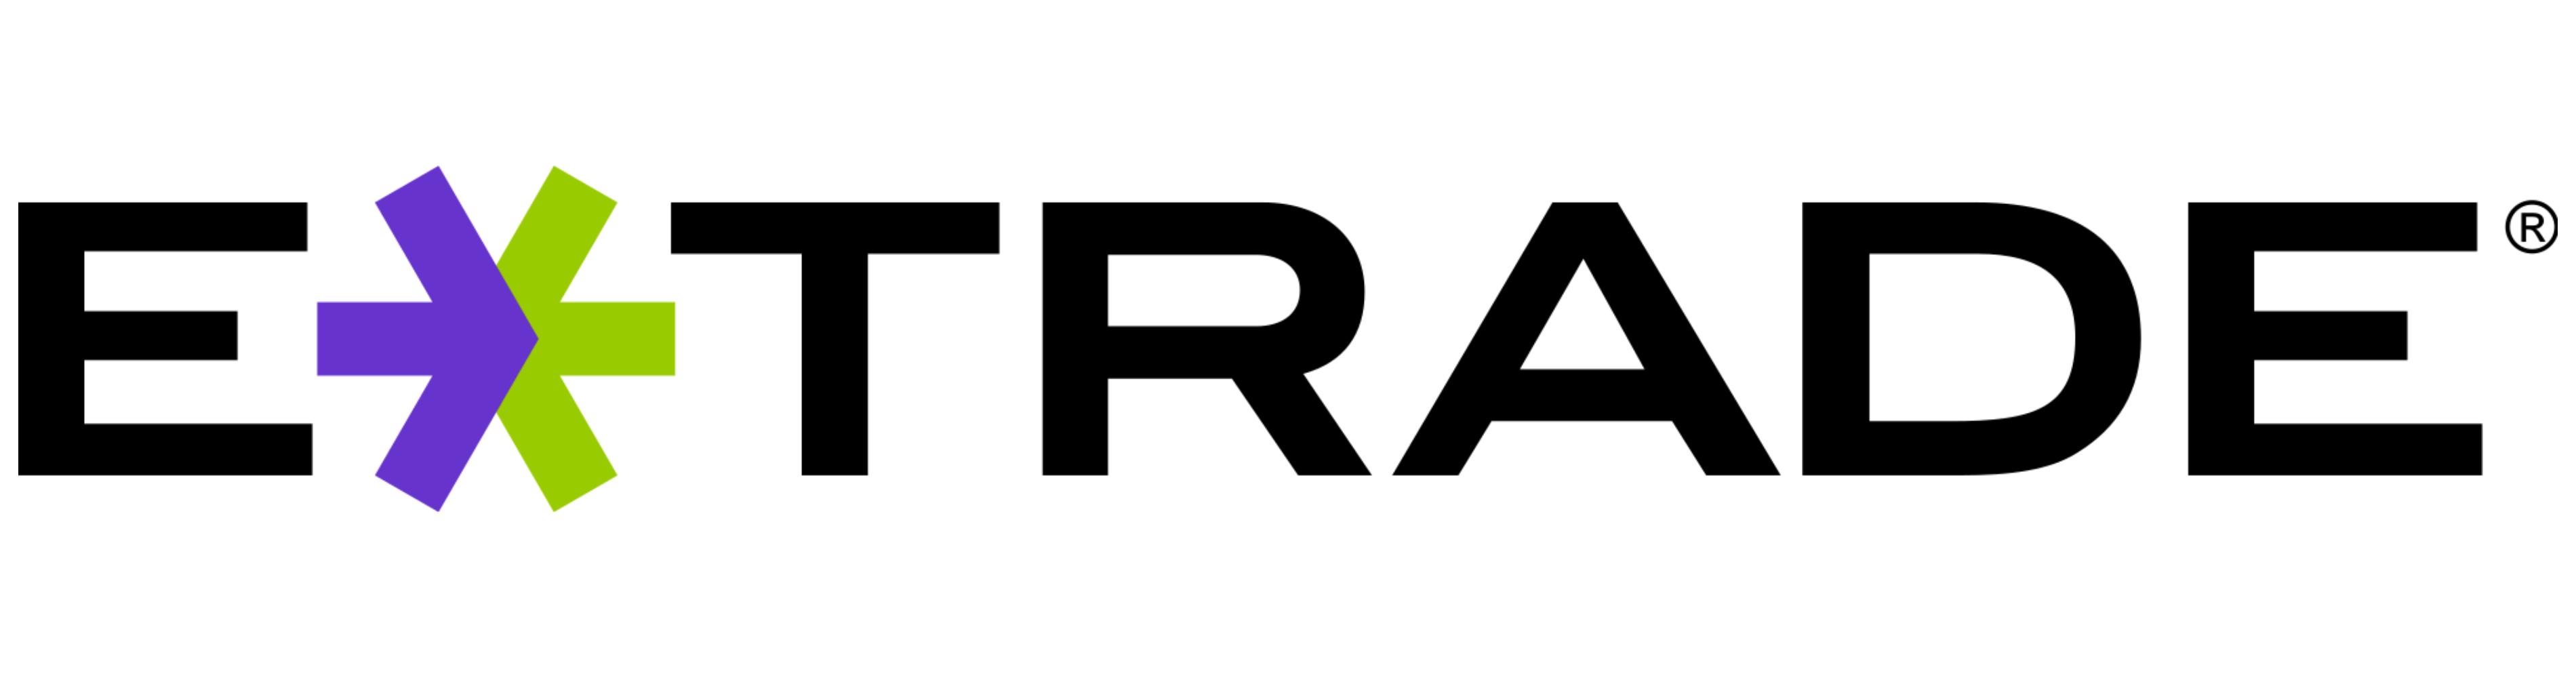 E*TRADE Mobile app - The Wealth Mosaic